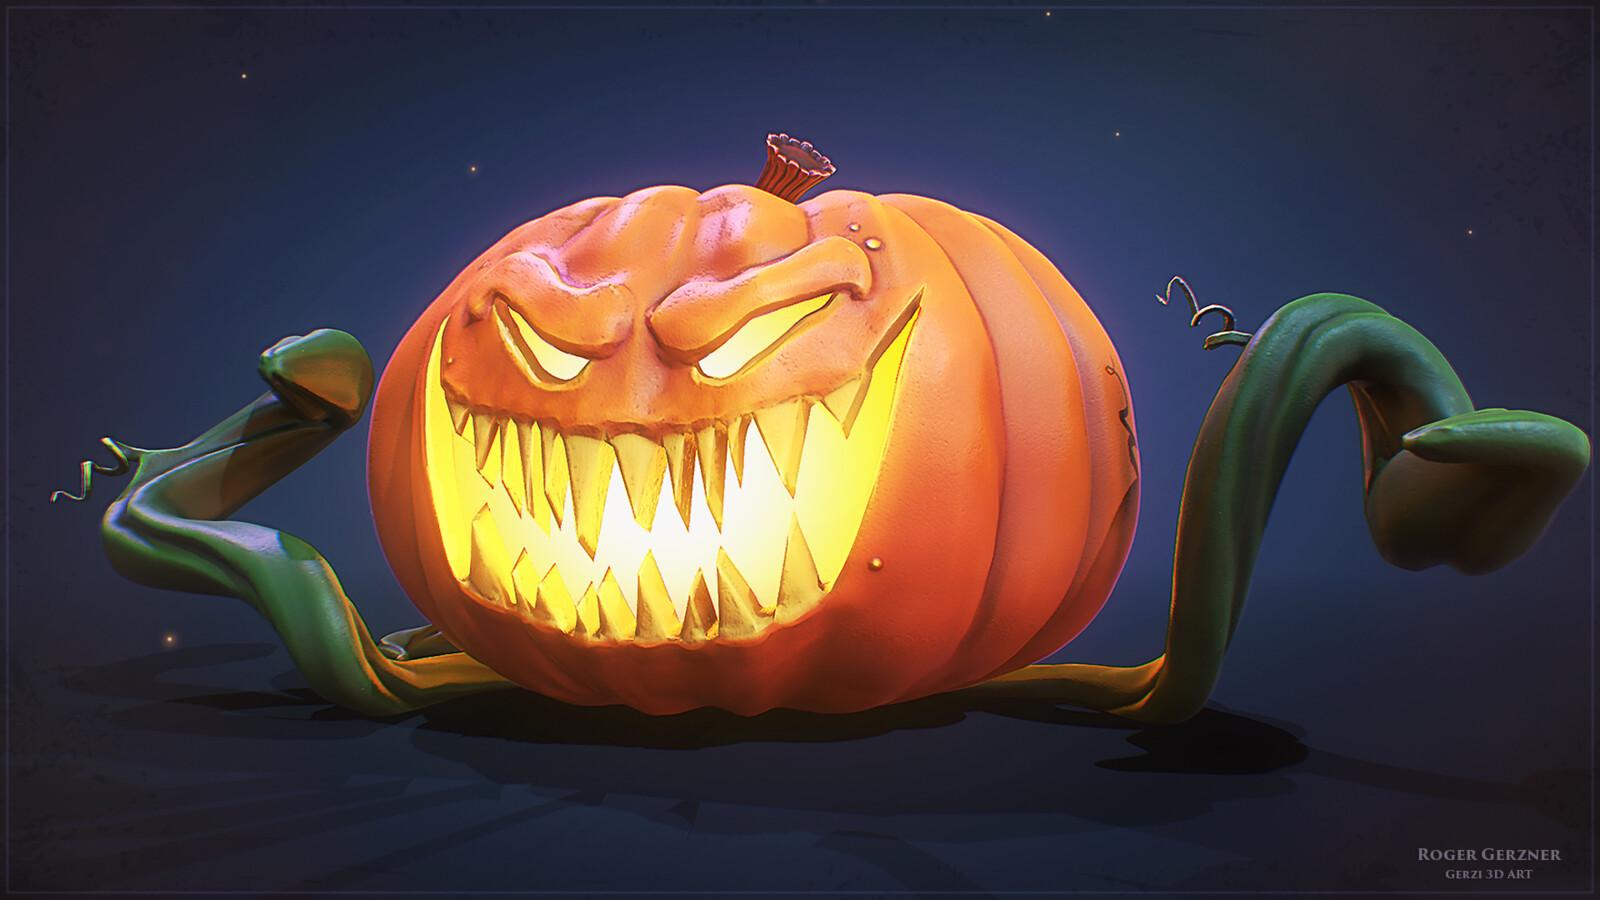 Stylized Halloween Jack-o'-lantern